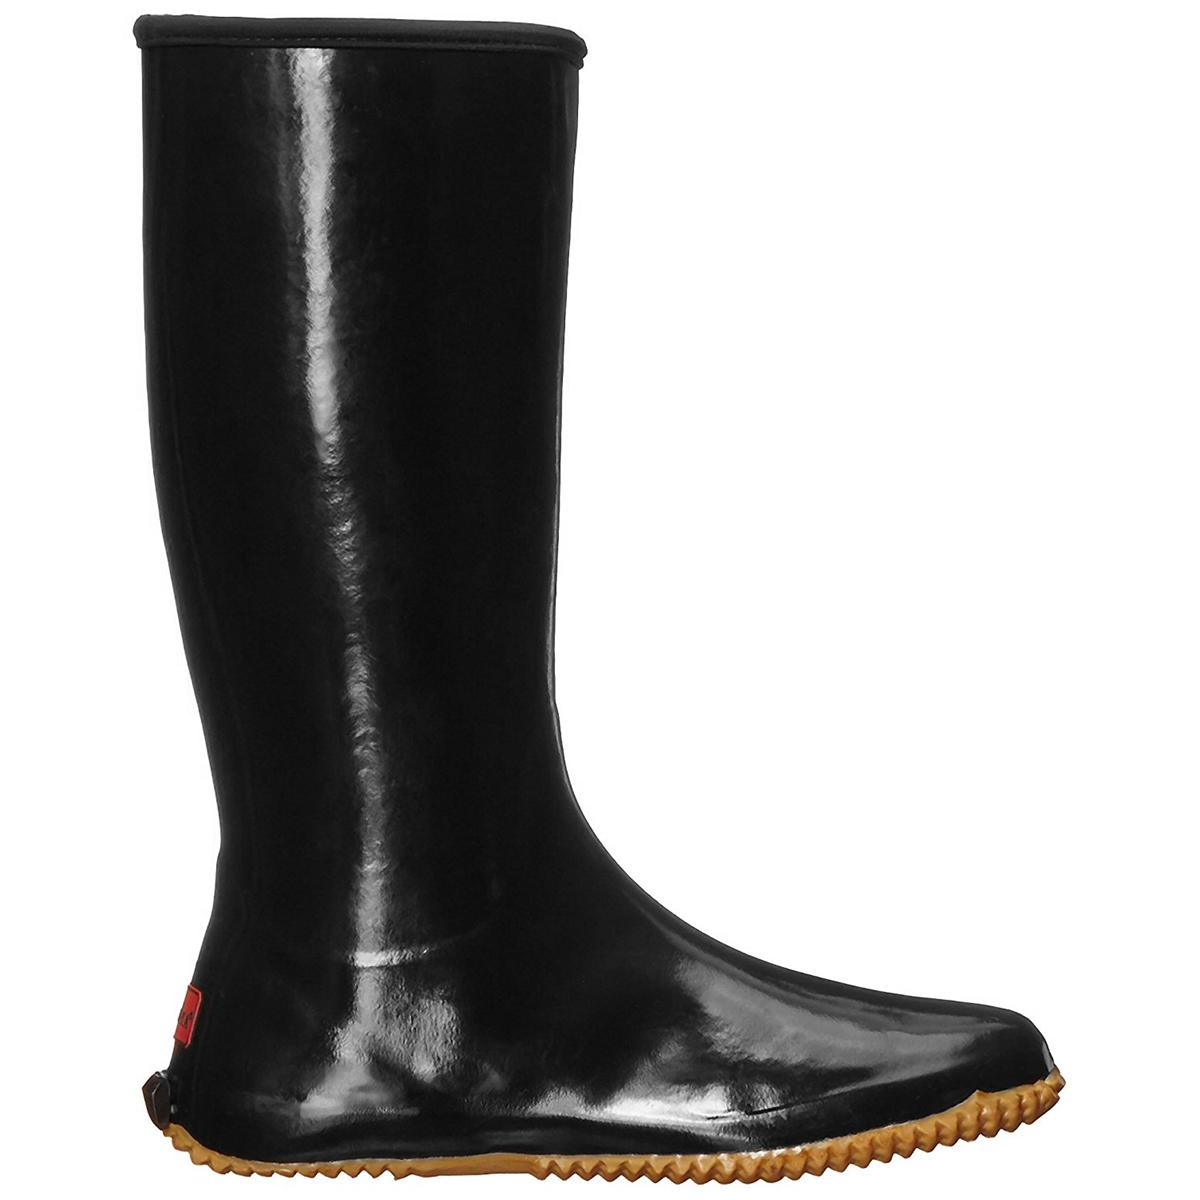 Chooka-Women-039-s-Rubber-Rain-Boots-Mid-Calf-With-Lightweight-Packable-Travel-Bag thumbnail 12